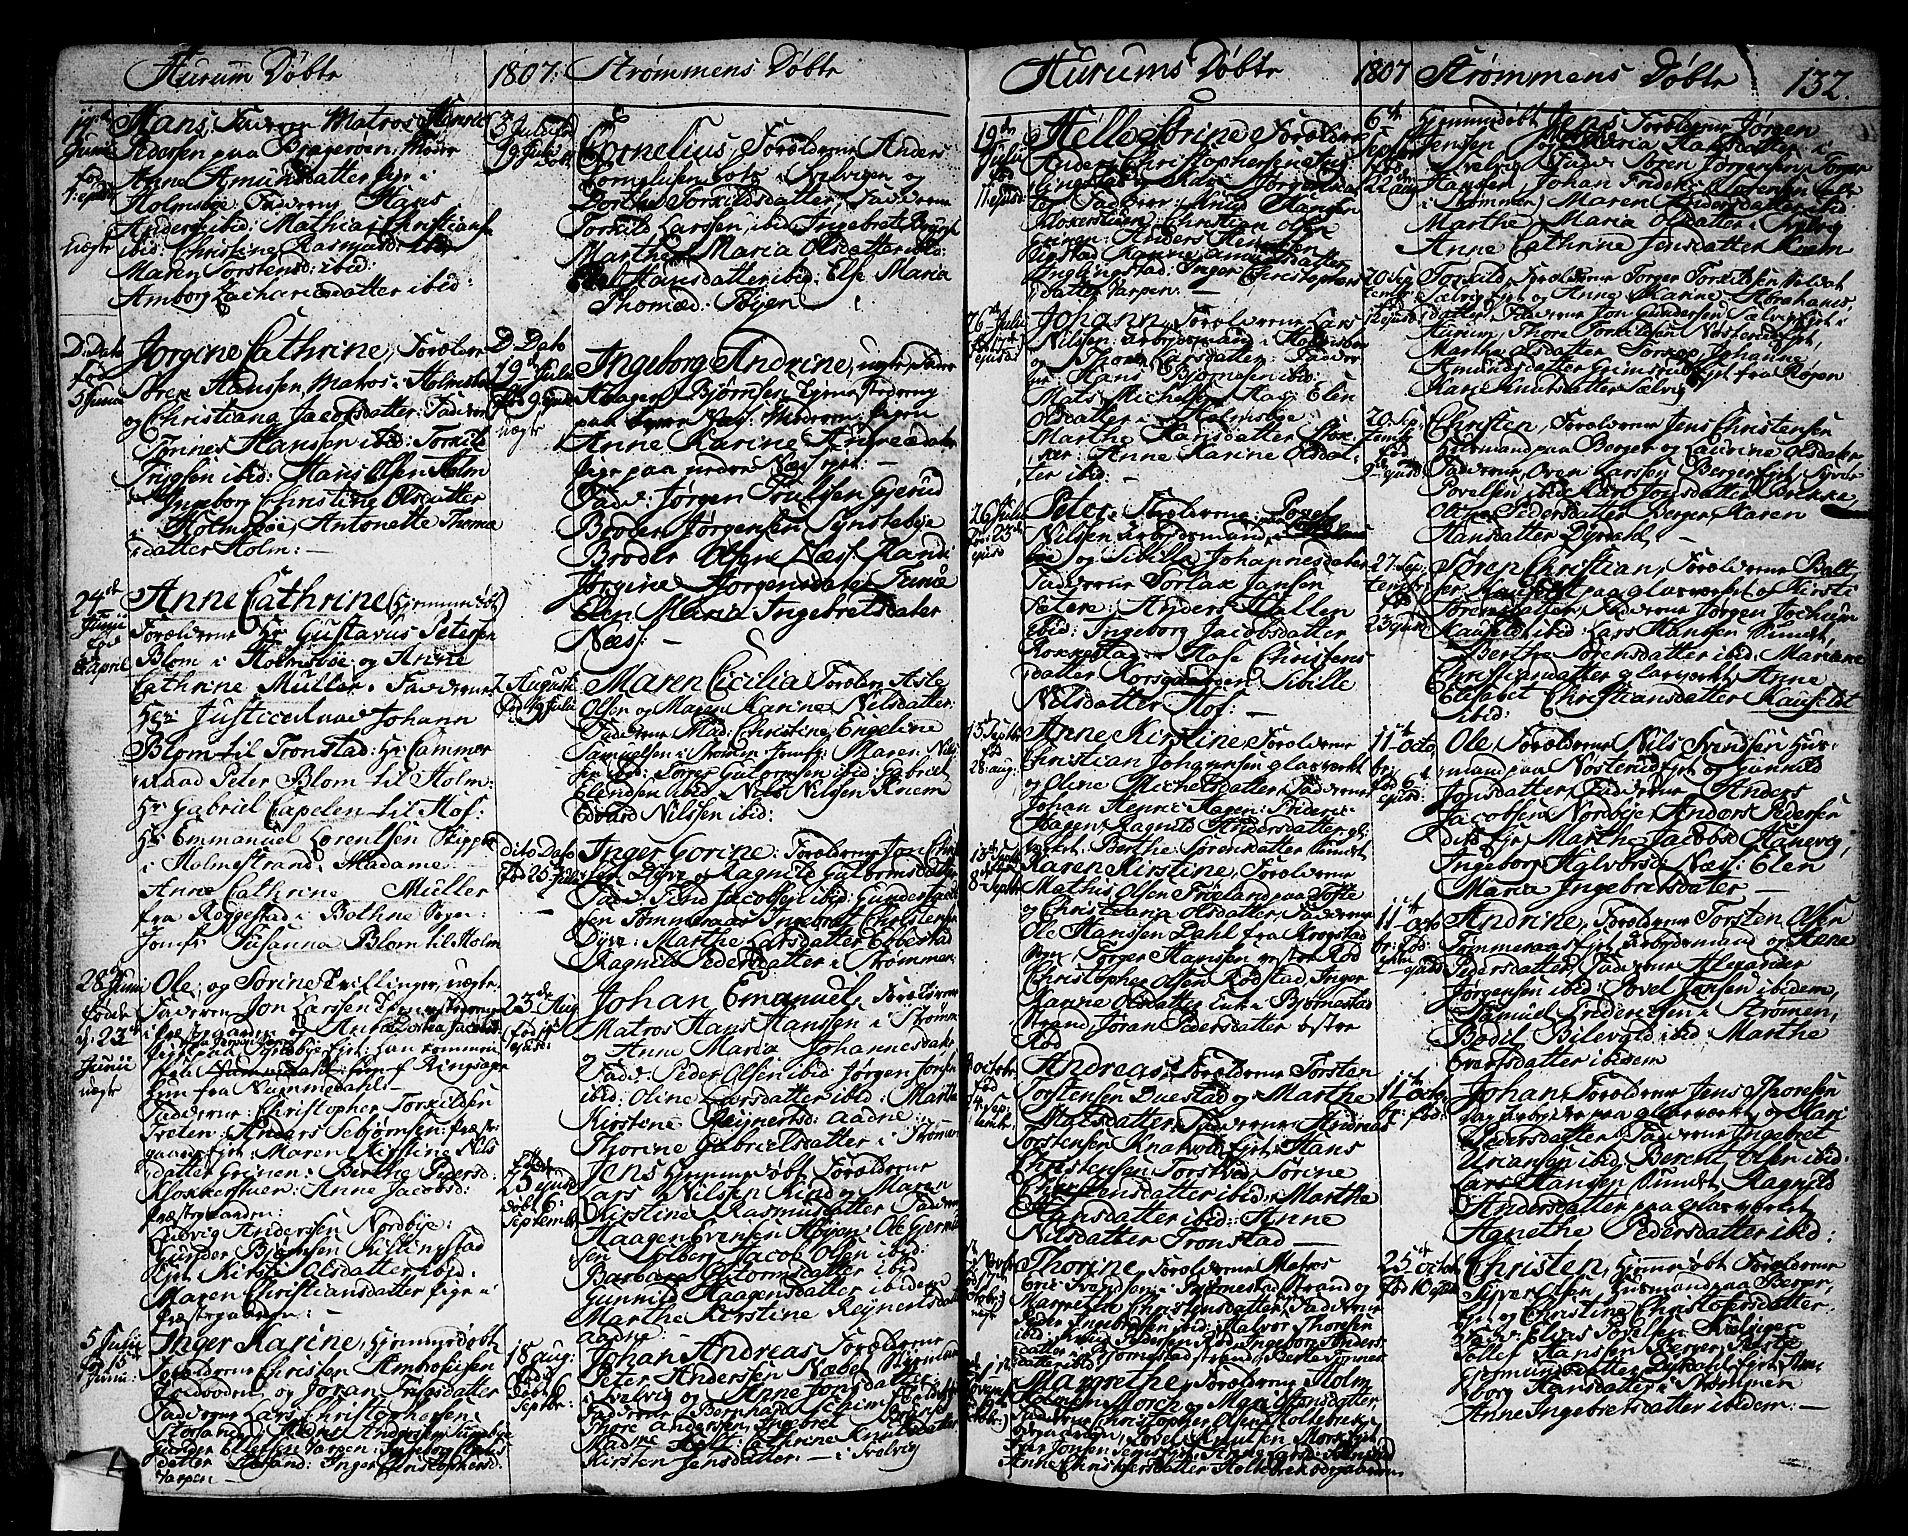 SAKO, Hurum kirkebøker, F/Fa/L0007: Ministerialbok nr. 7, 1771-1810, s. 132